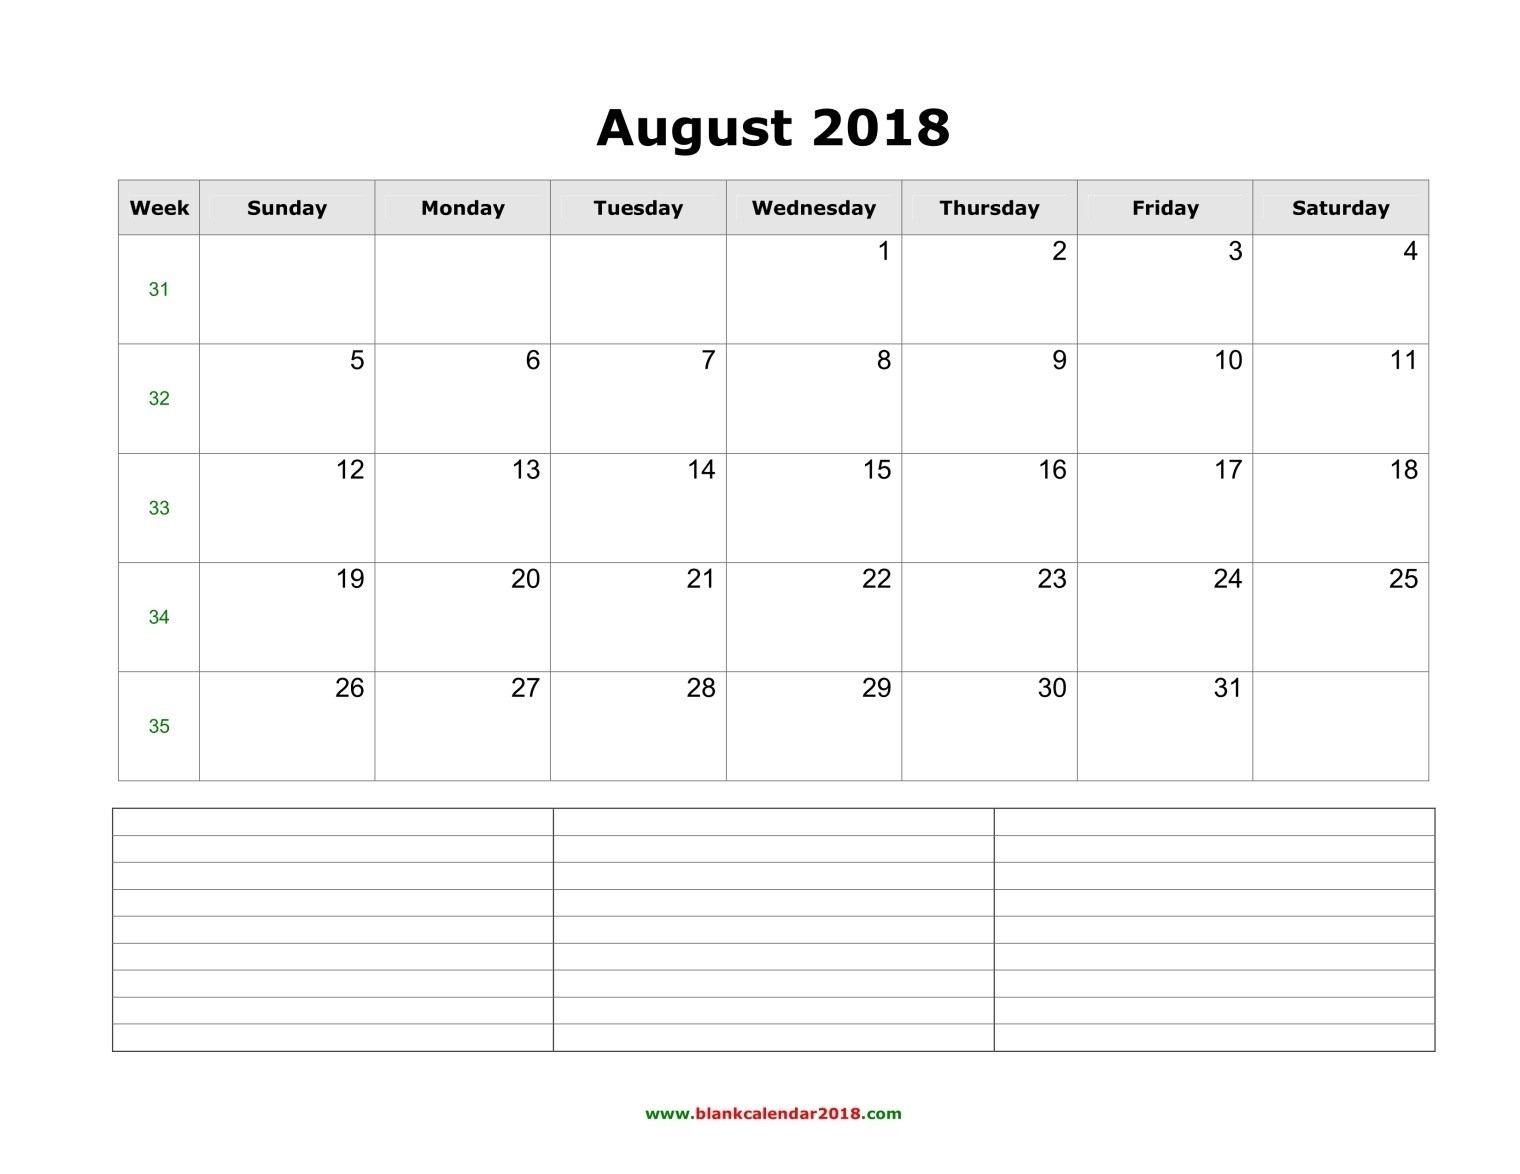 2019 Blank Calendar Template With Notes - Template  Wall Calendar Frame Plan - Item 49887 Clone